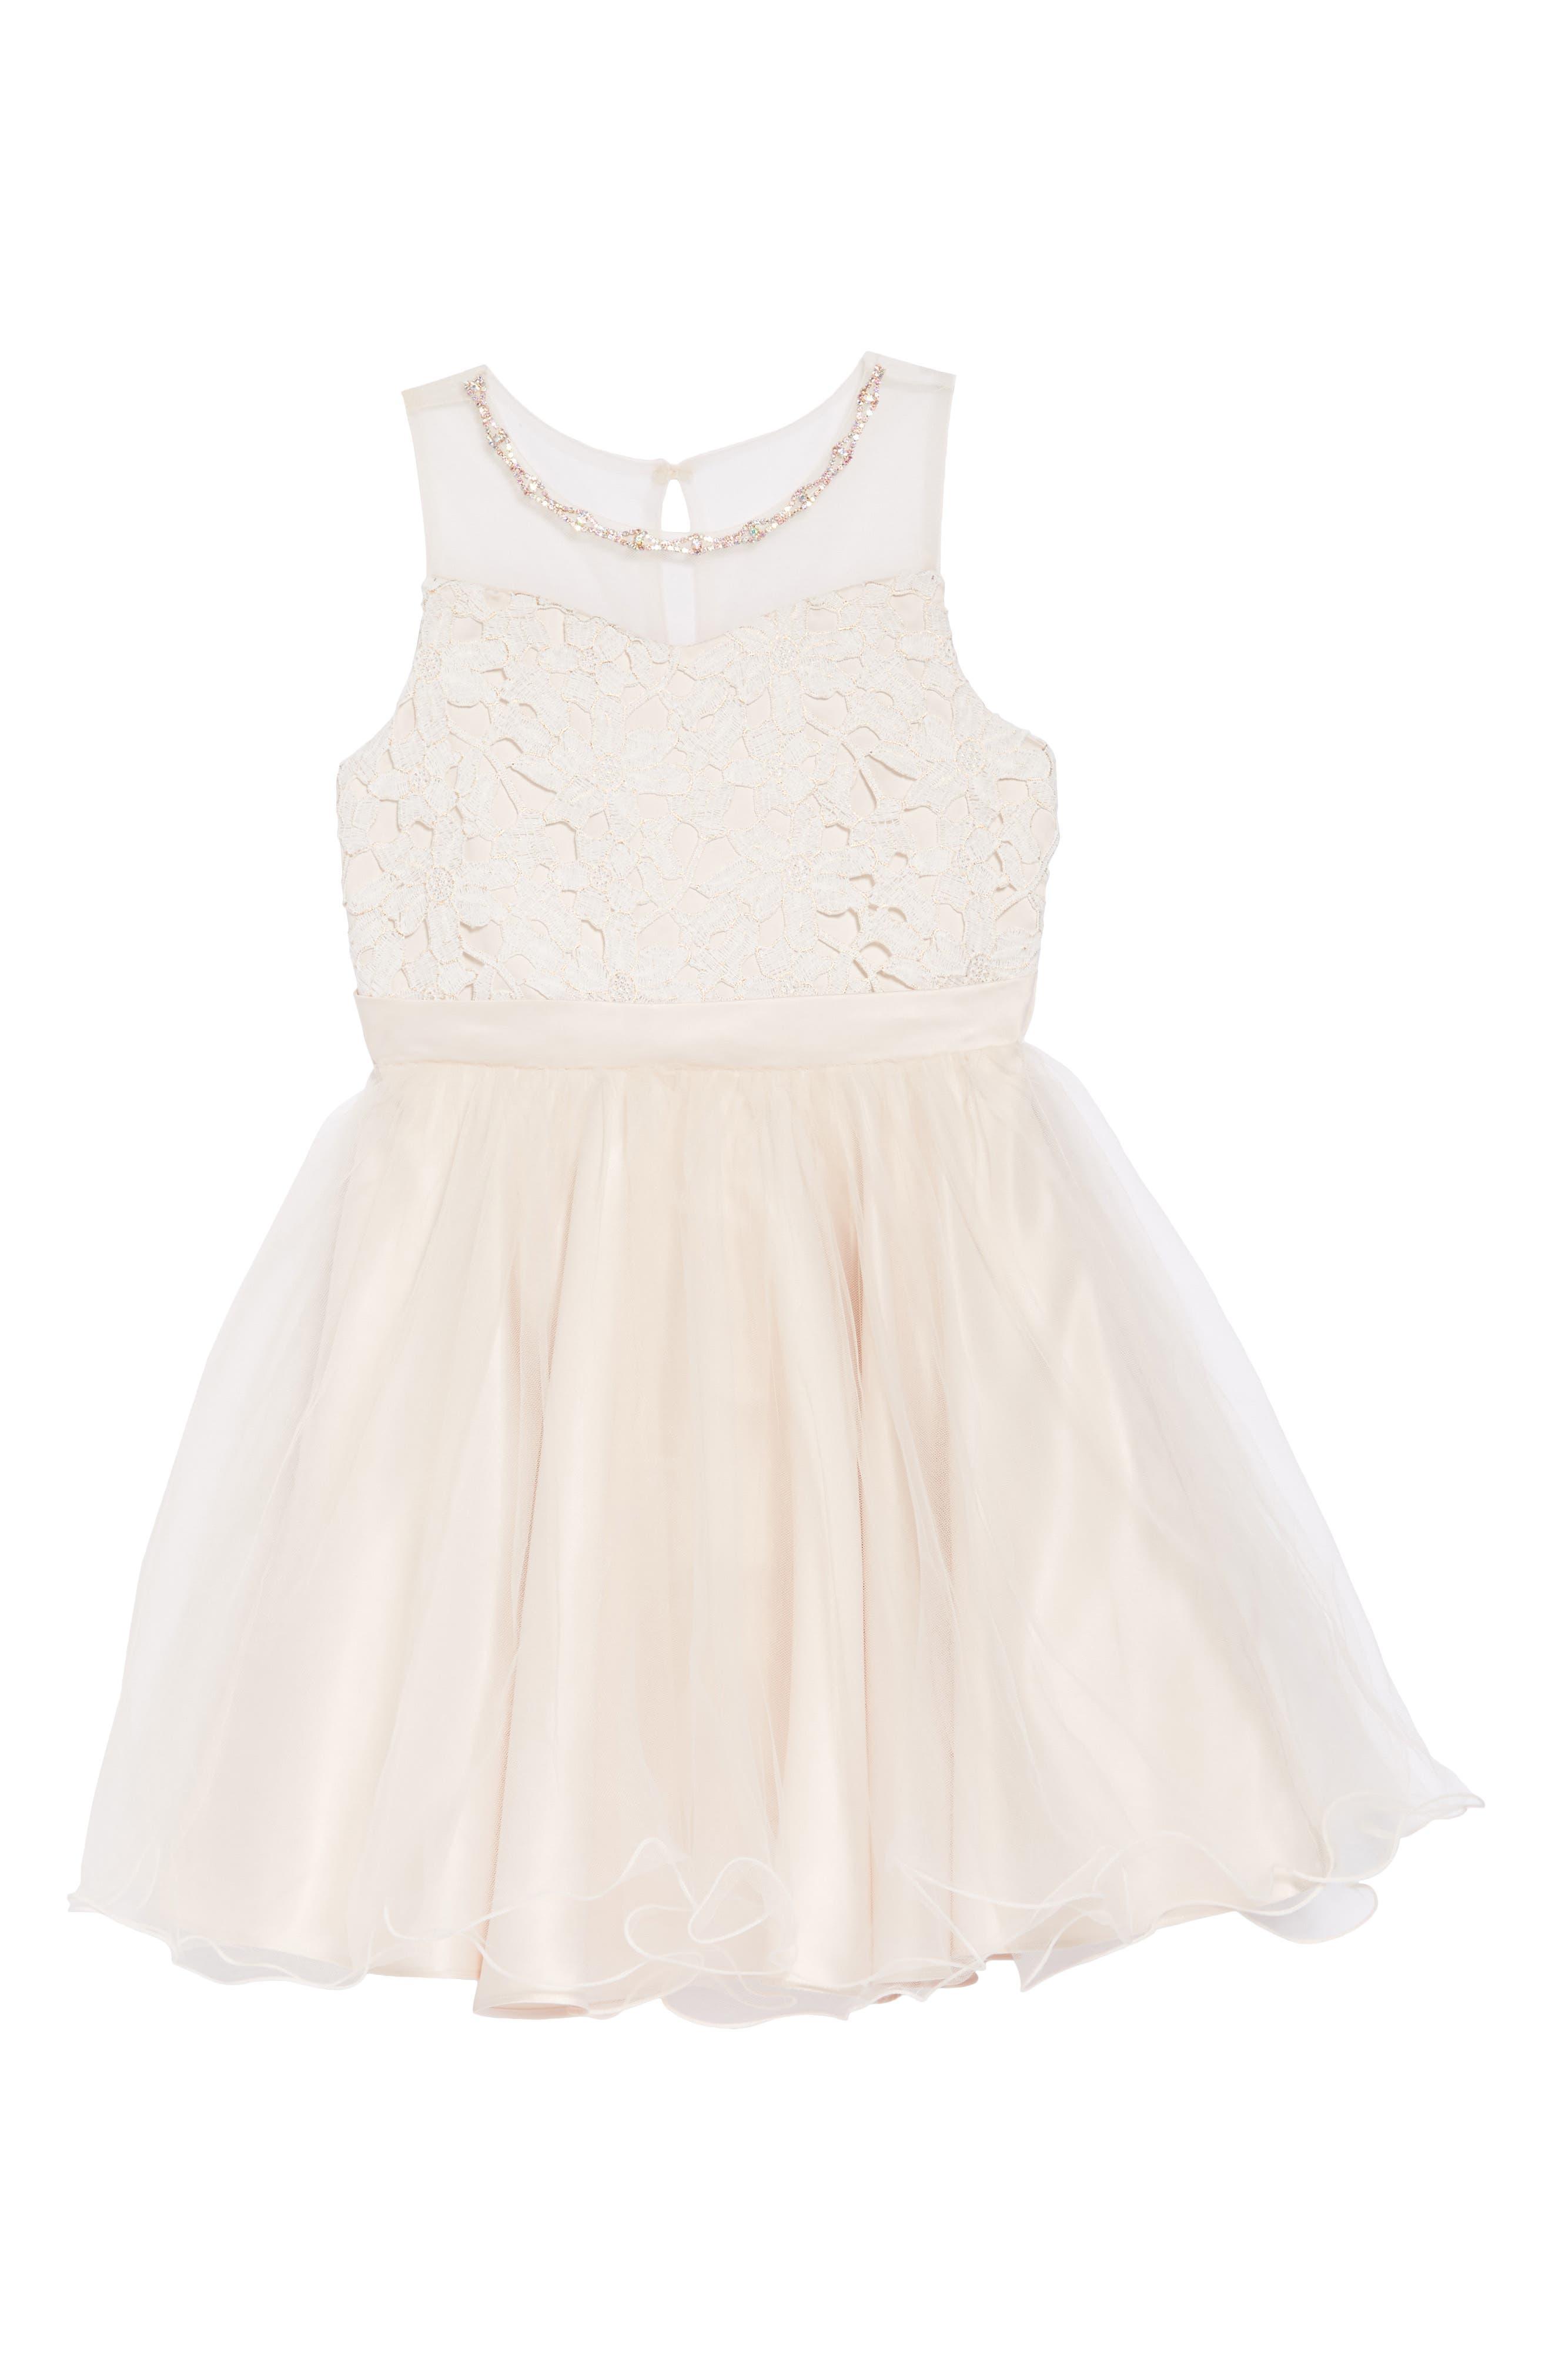 Lace Bodice Tulle Dress,                             Main thumbnail 1, color,                             113